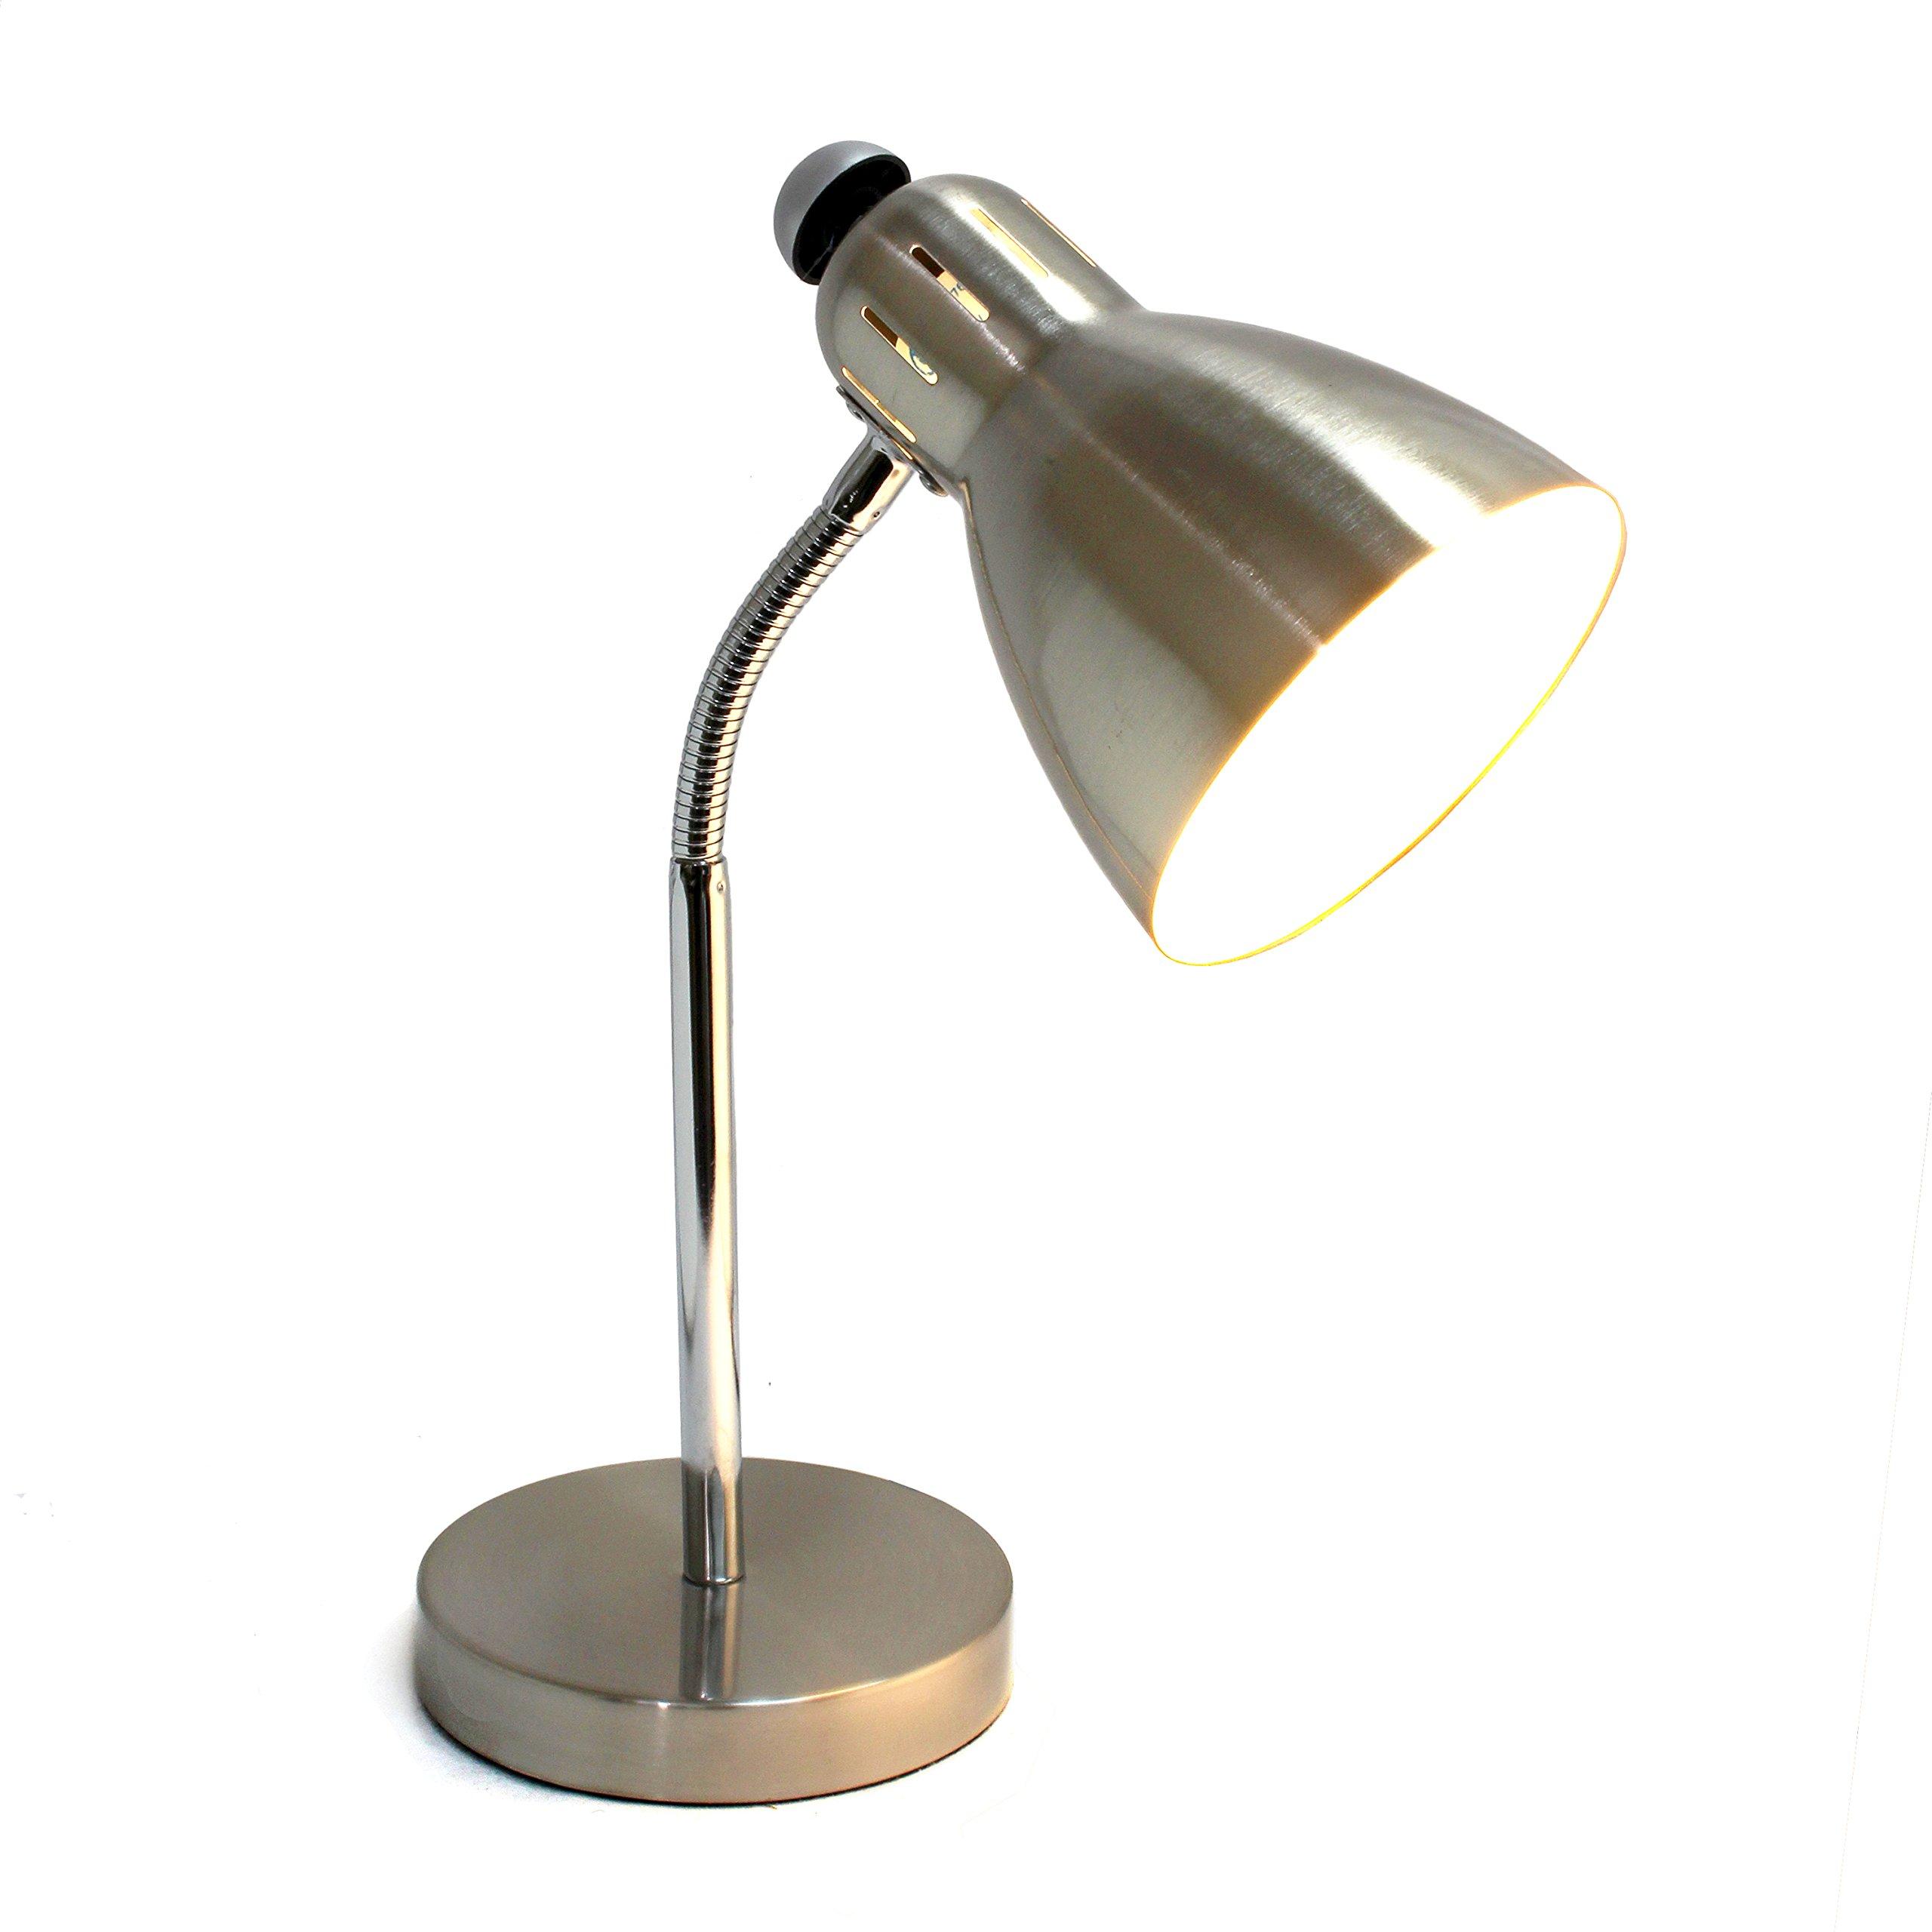 Simple Designs Home LD1037-BSN Simple Designs Semi-FLEXIBLE Desk Lamp, Brushed Nickel